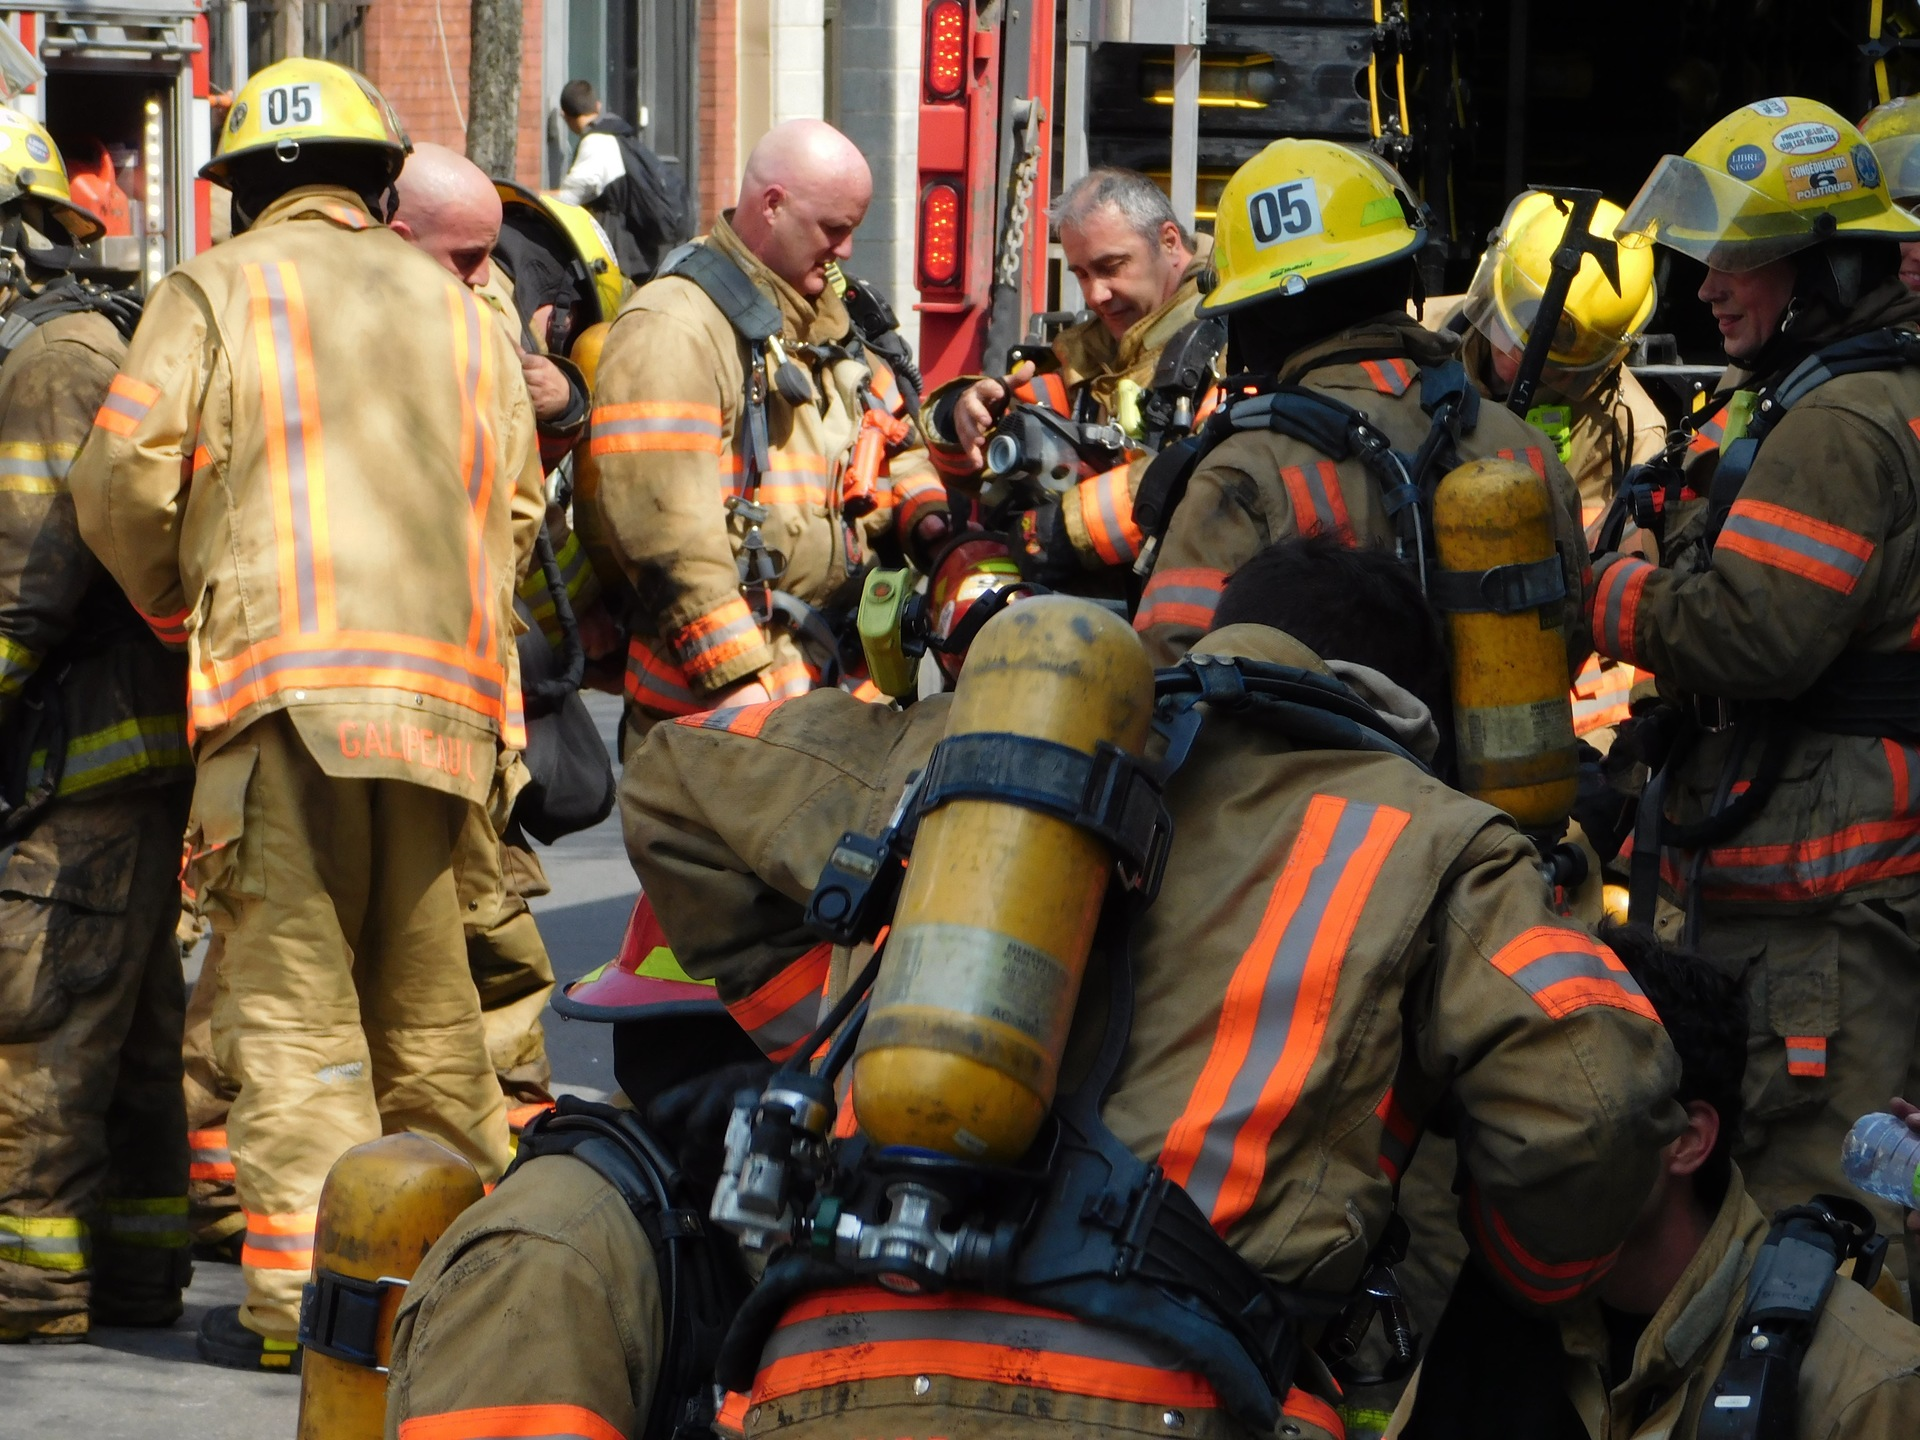 Montreal firemen   rick.cognyl.fournier, flame, uniform, fire